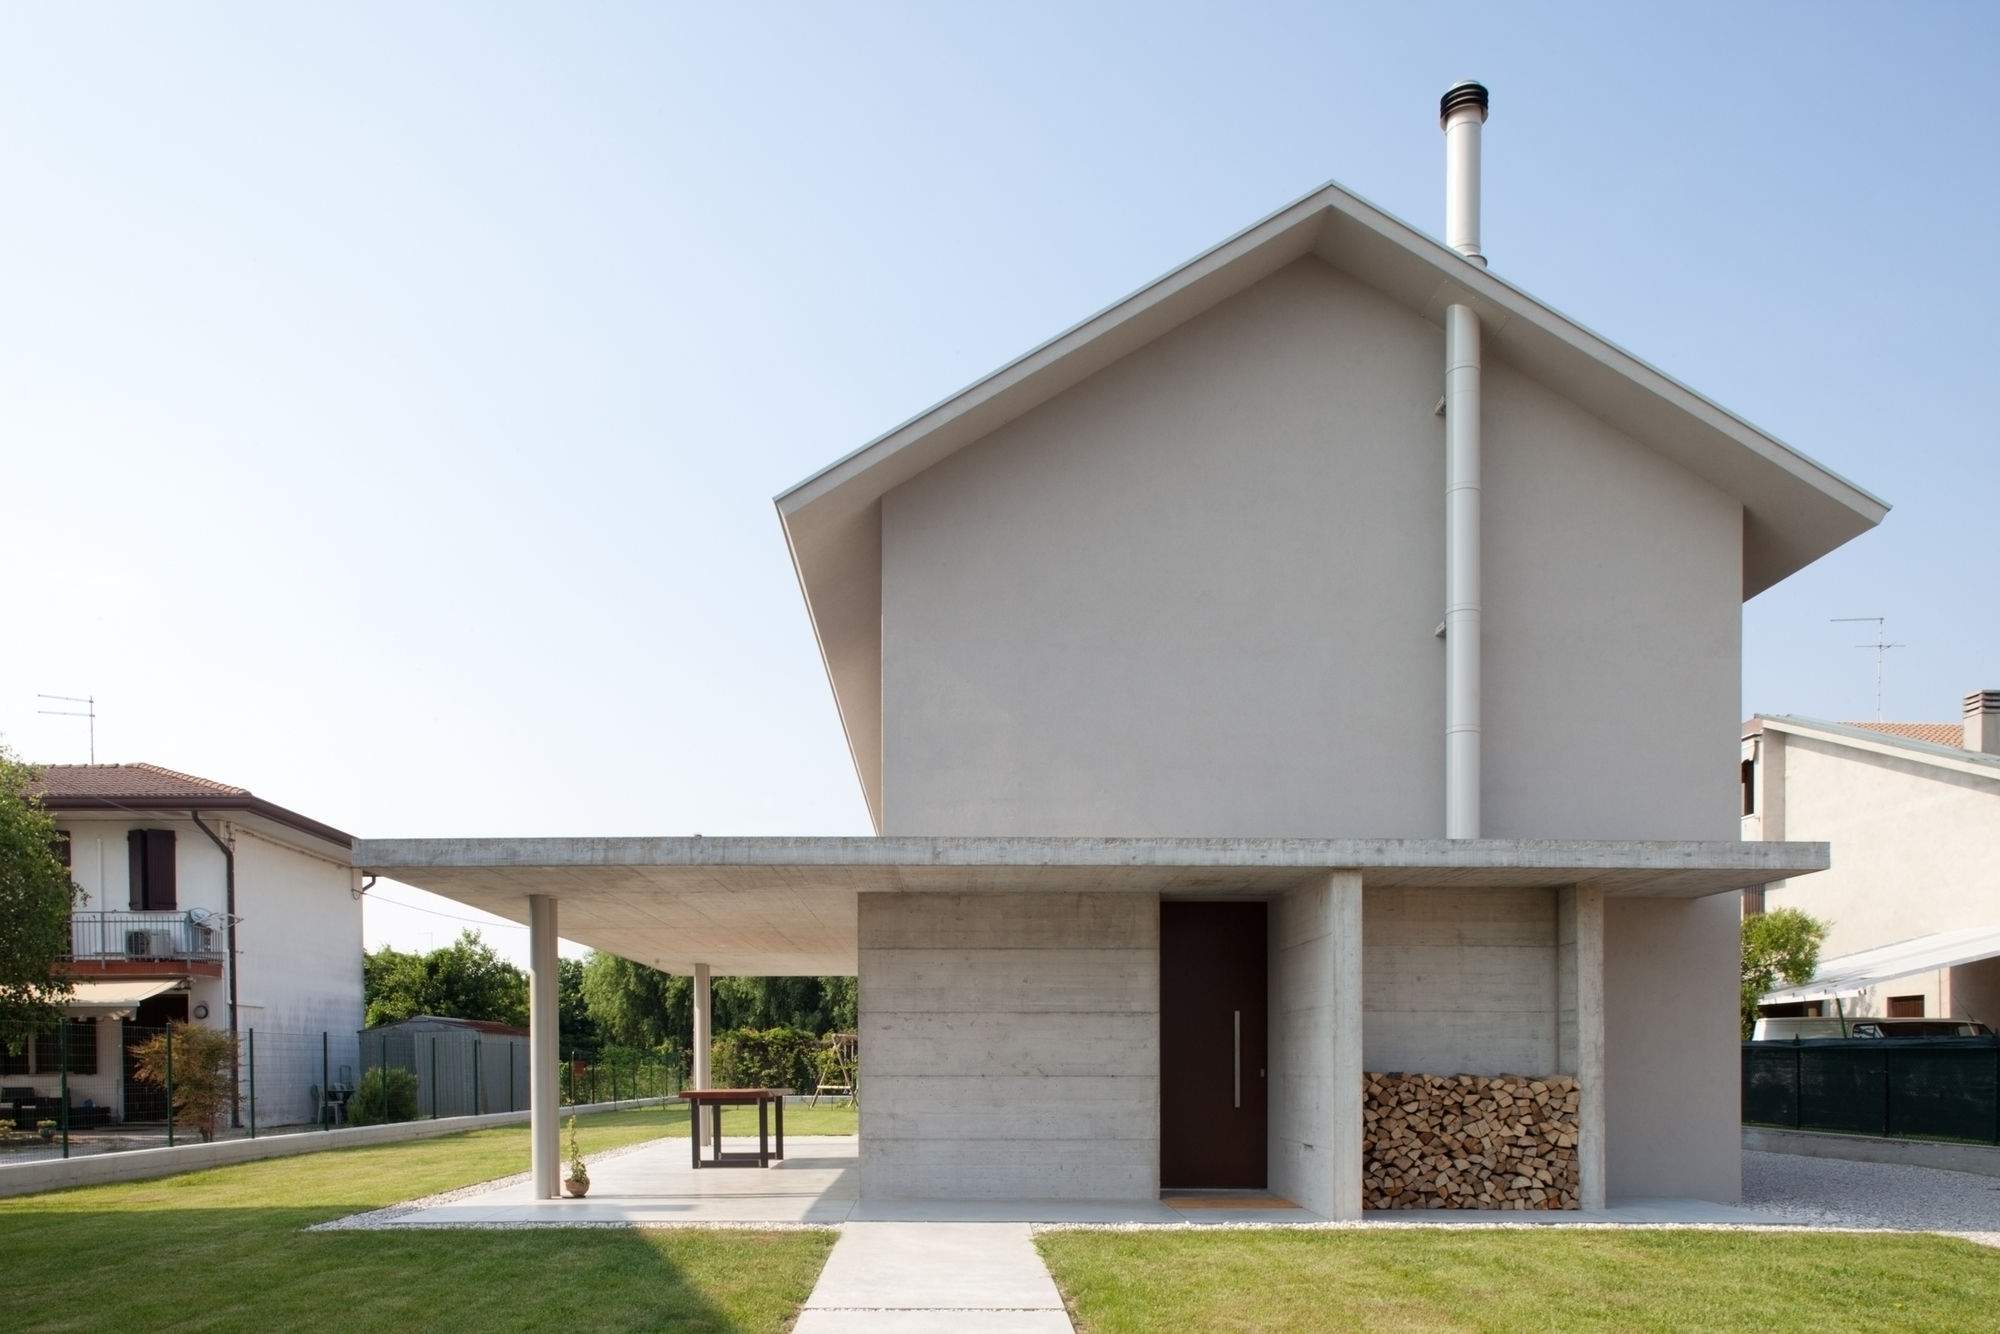 Detached House / MIDE architetti